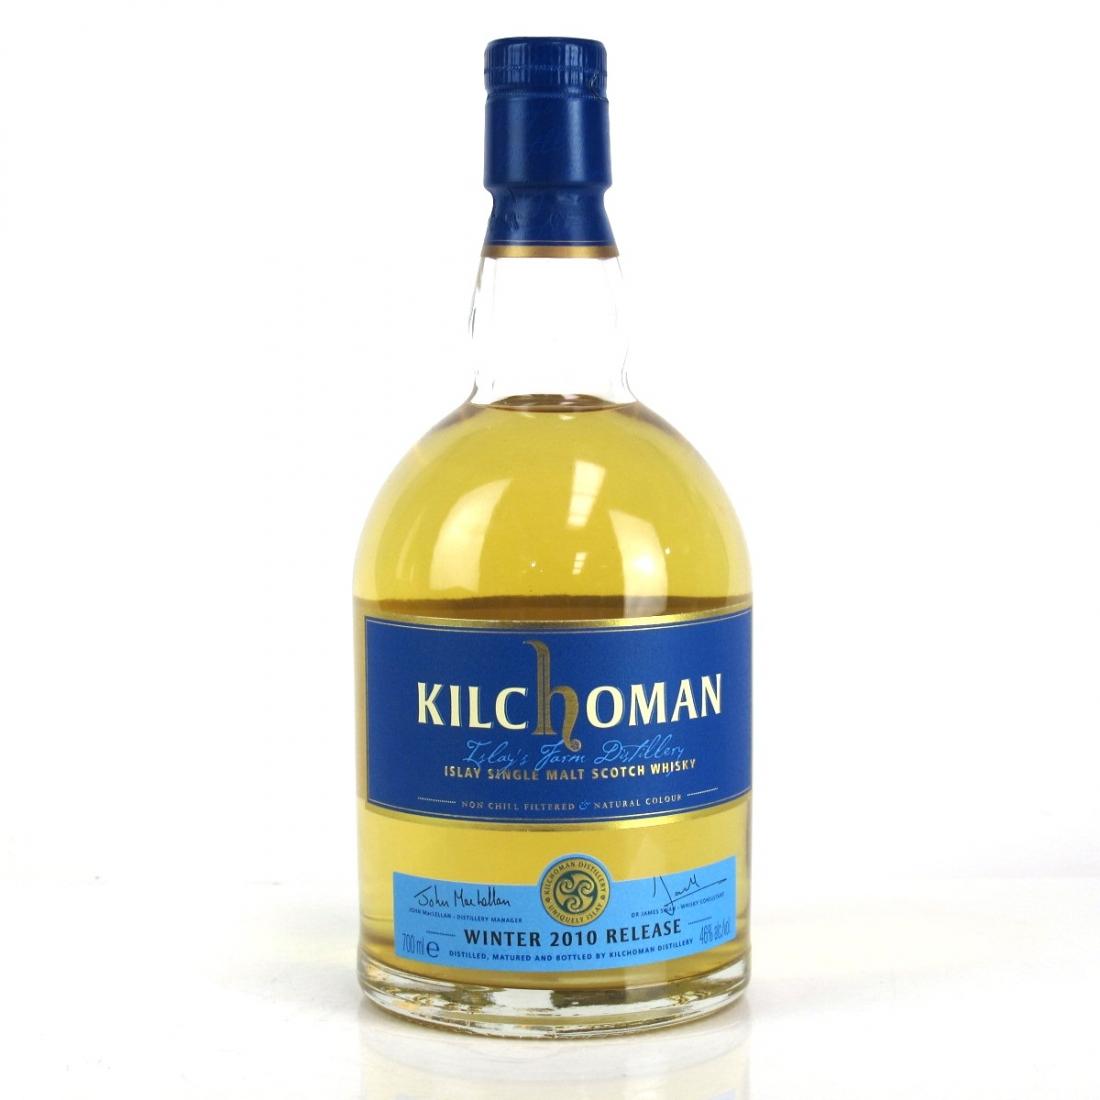 Kilchoman Winter Release 2010